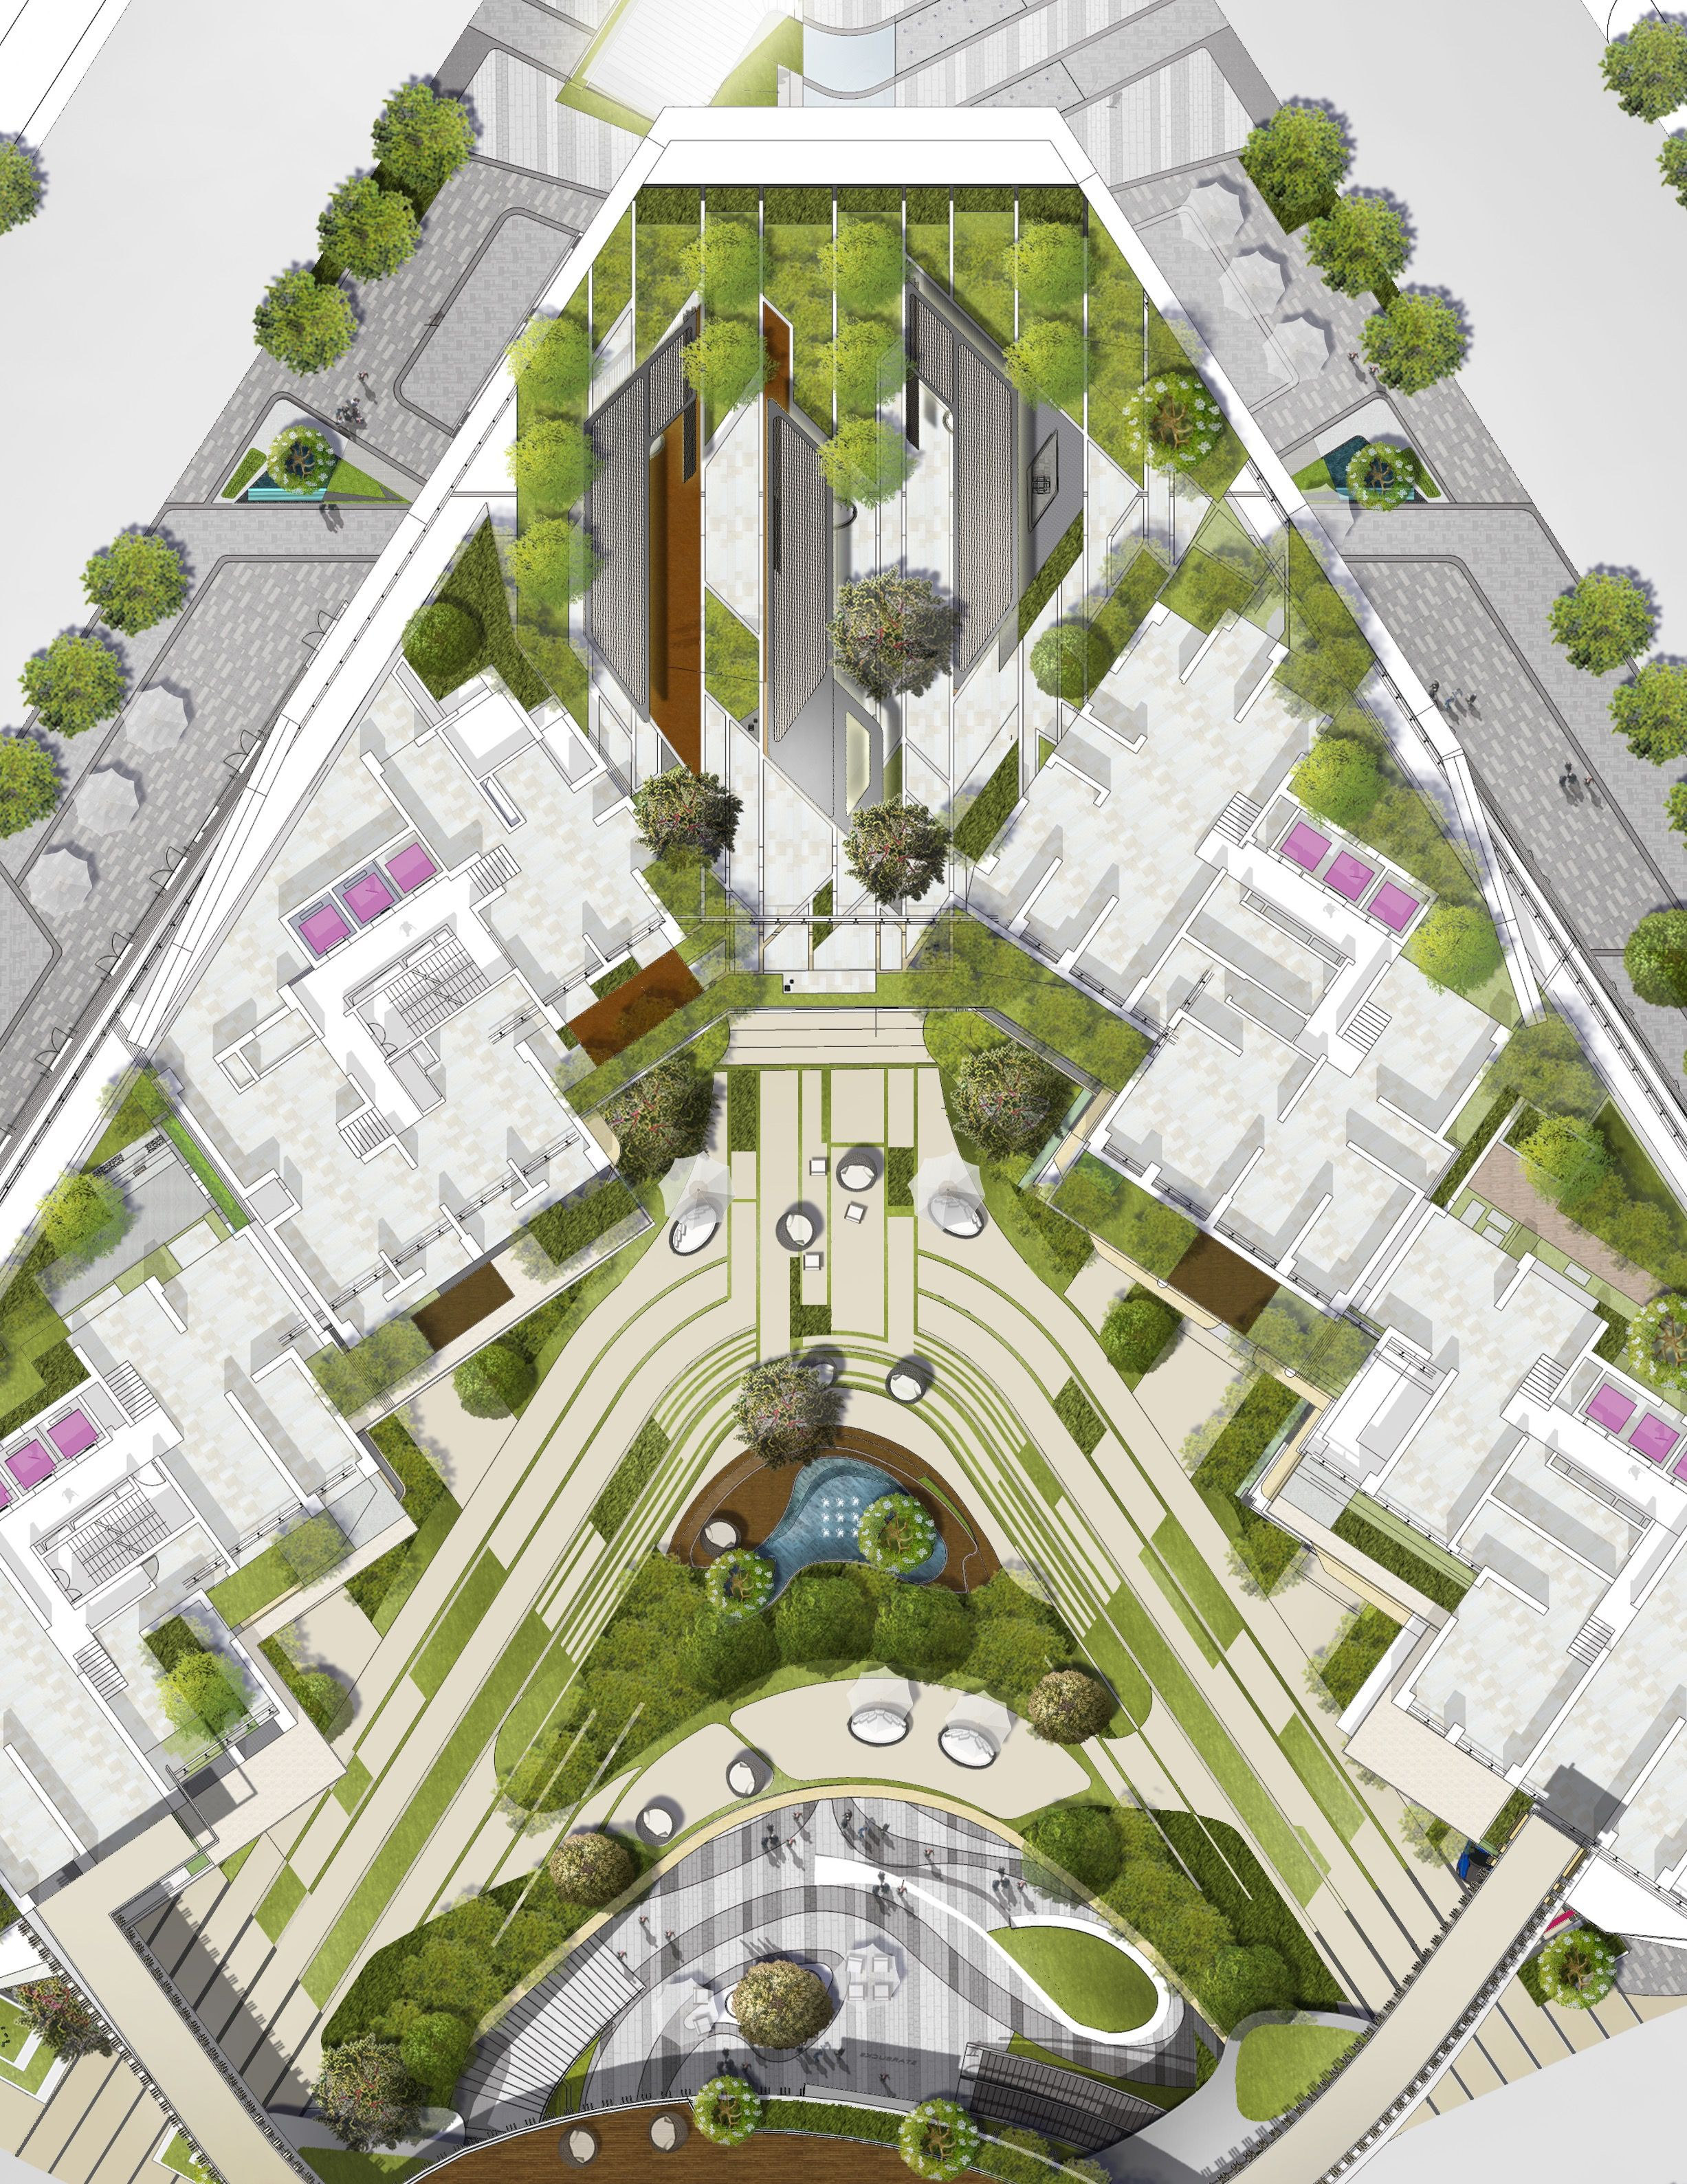 residential landscape design moplado 2015 metrostudio